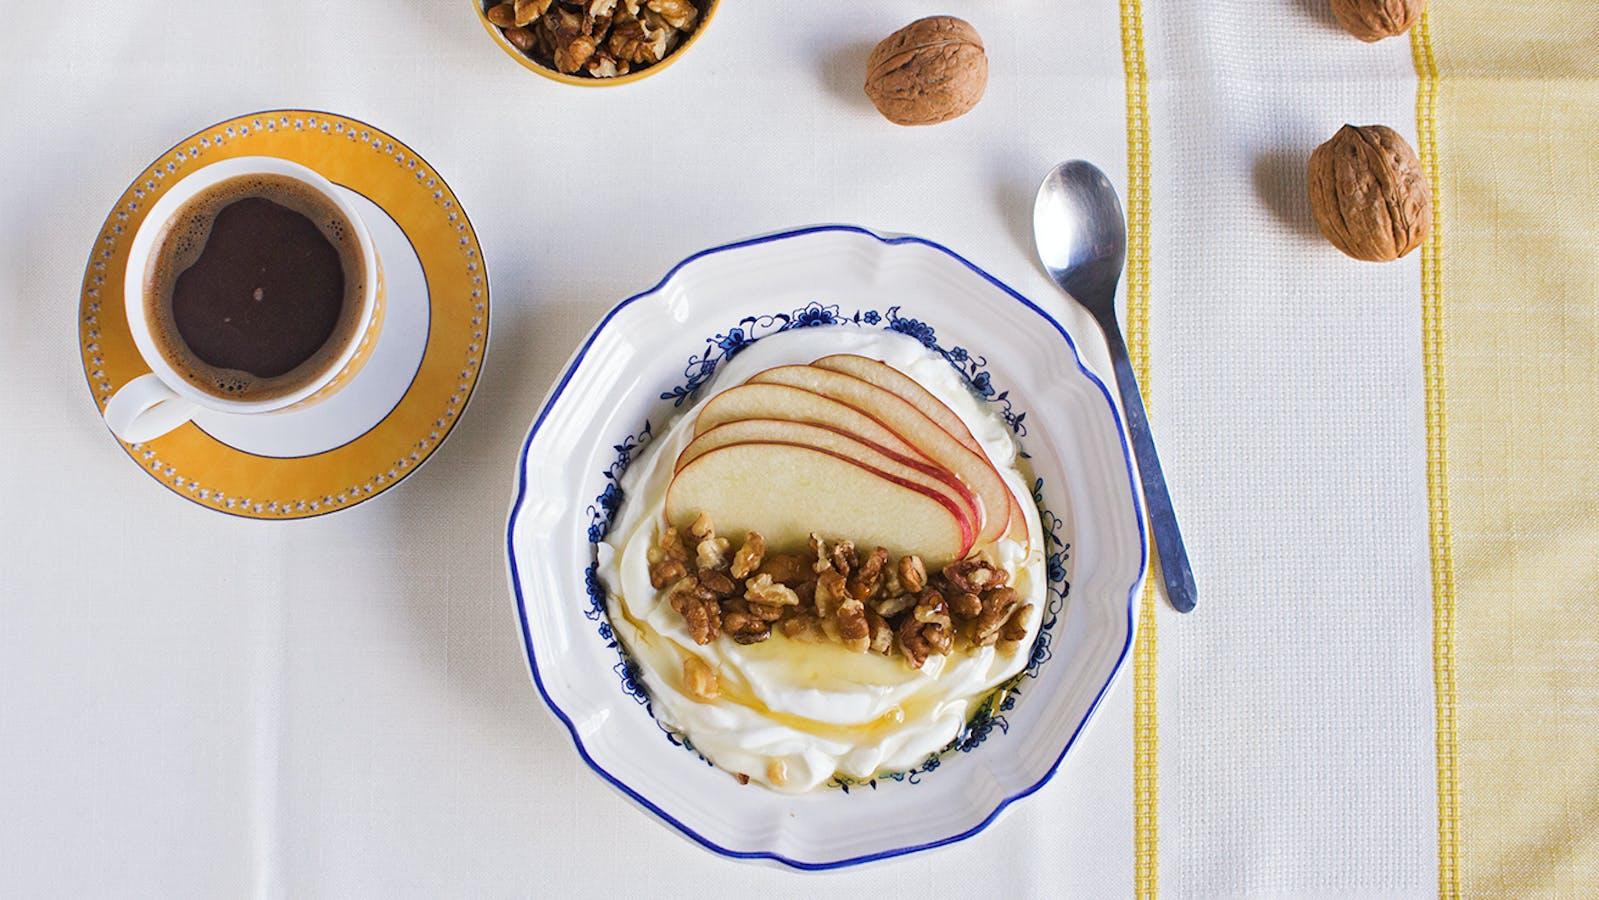 Greek breakfast: yogurt, honey and nuts